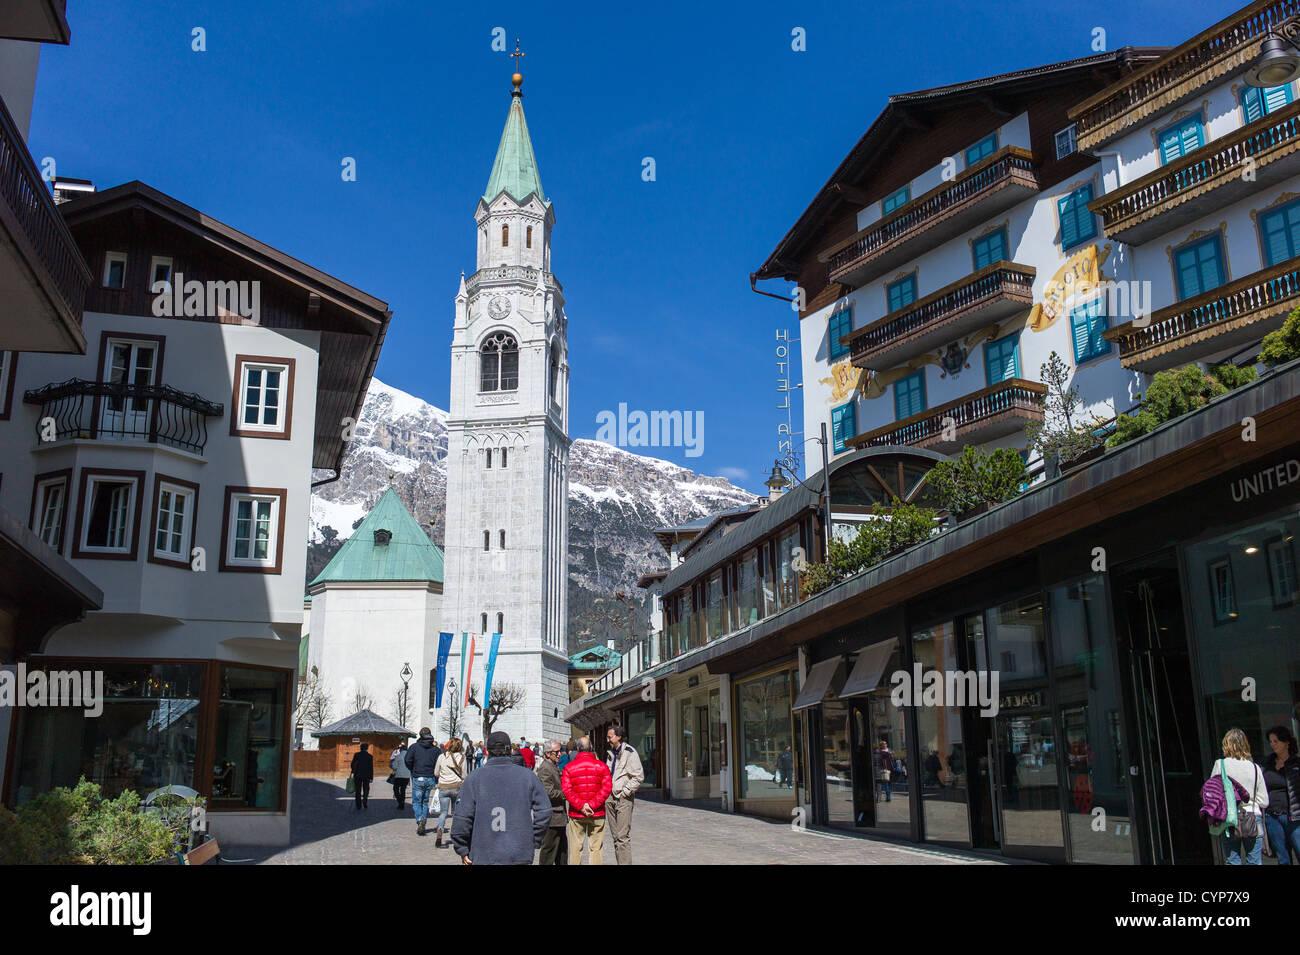 Italy, Dolomites, Veneto, Cortina D'Ampezzo, Corso Italia and the St Filippo and Giacomo parish church - Stock Image